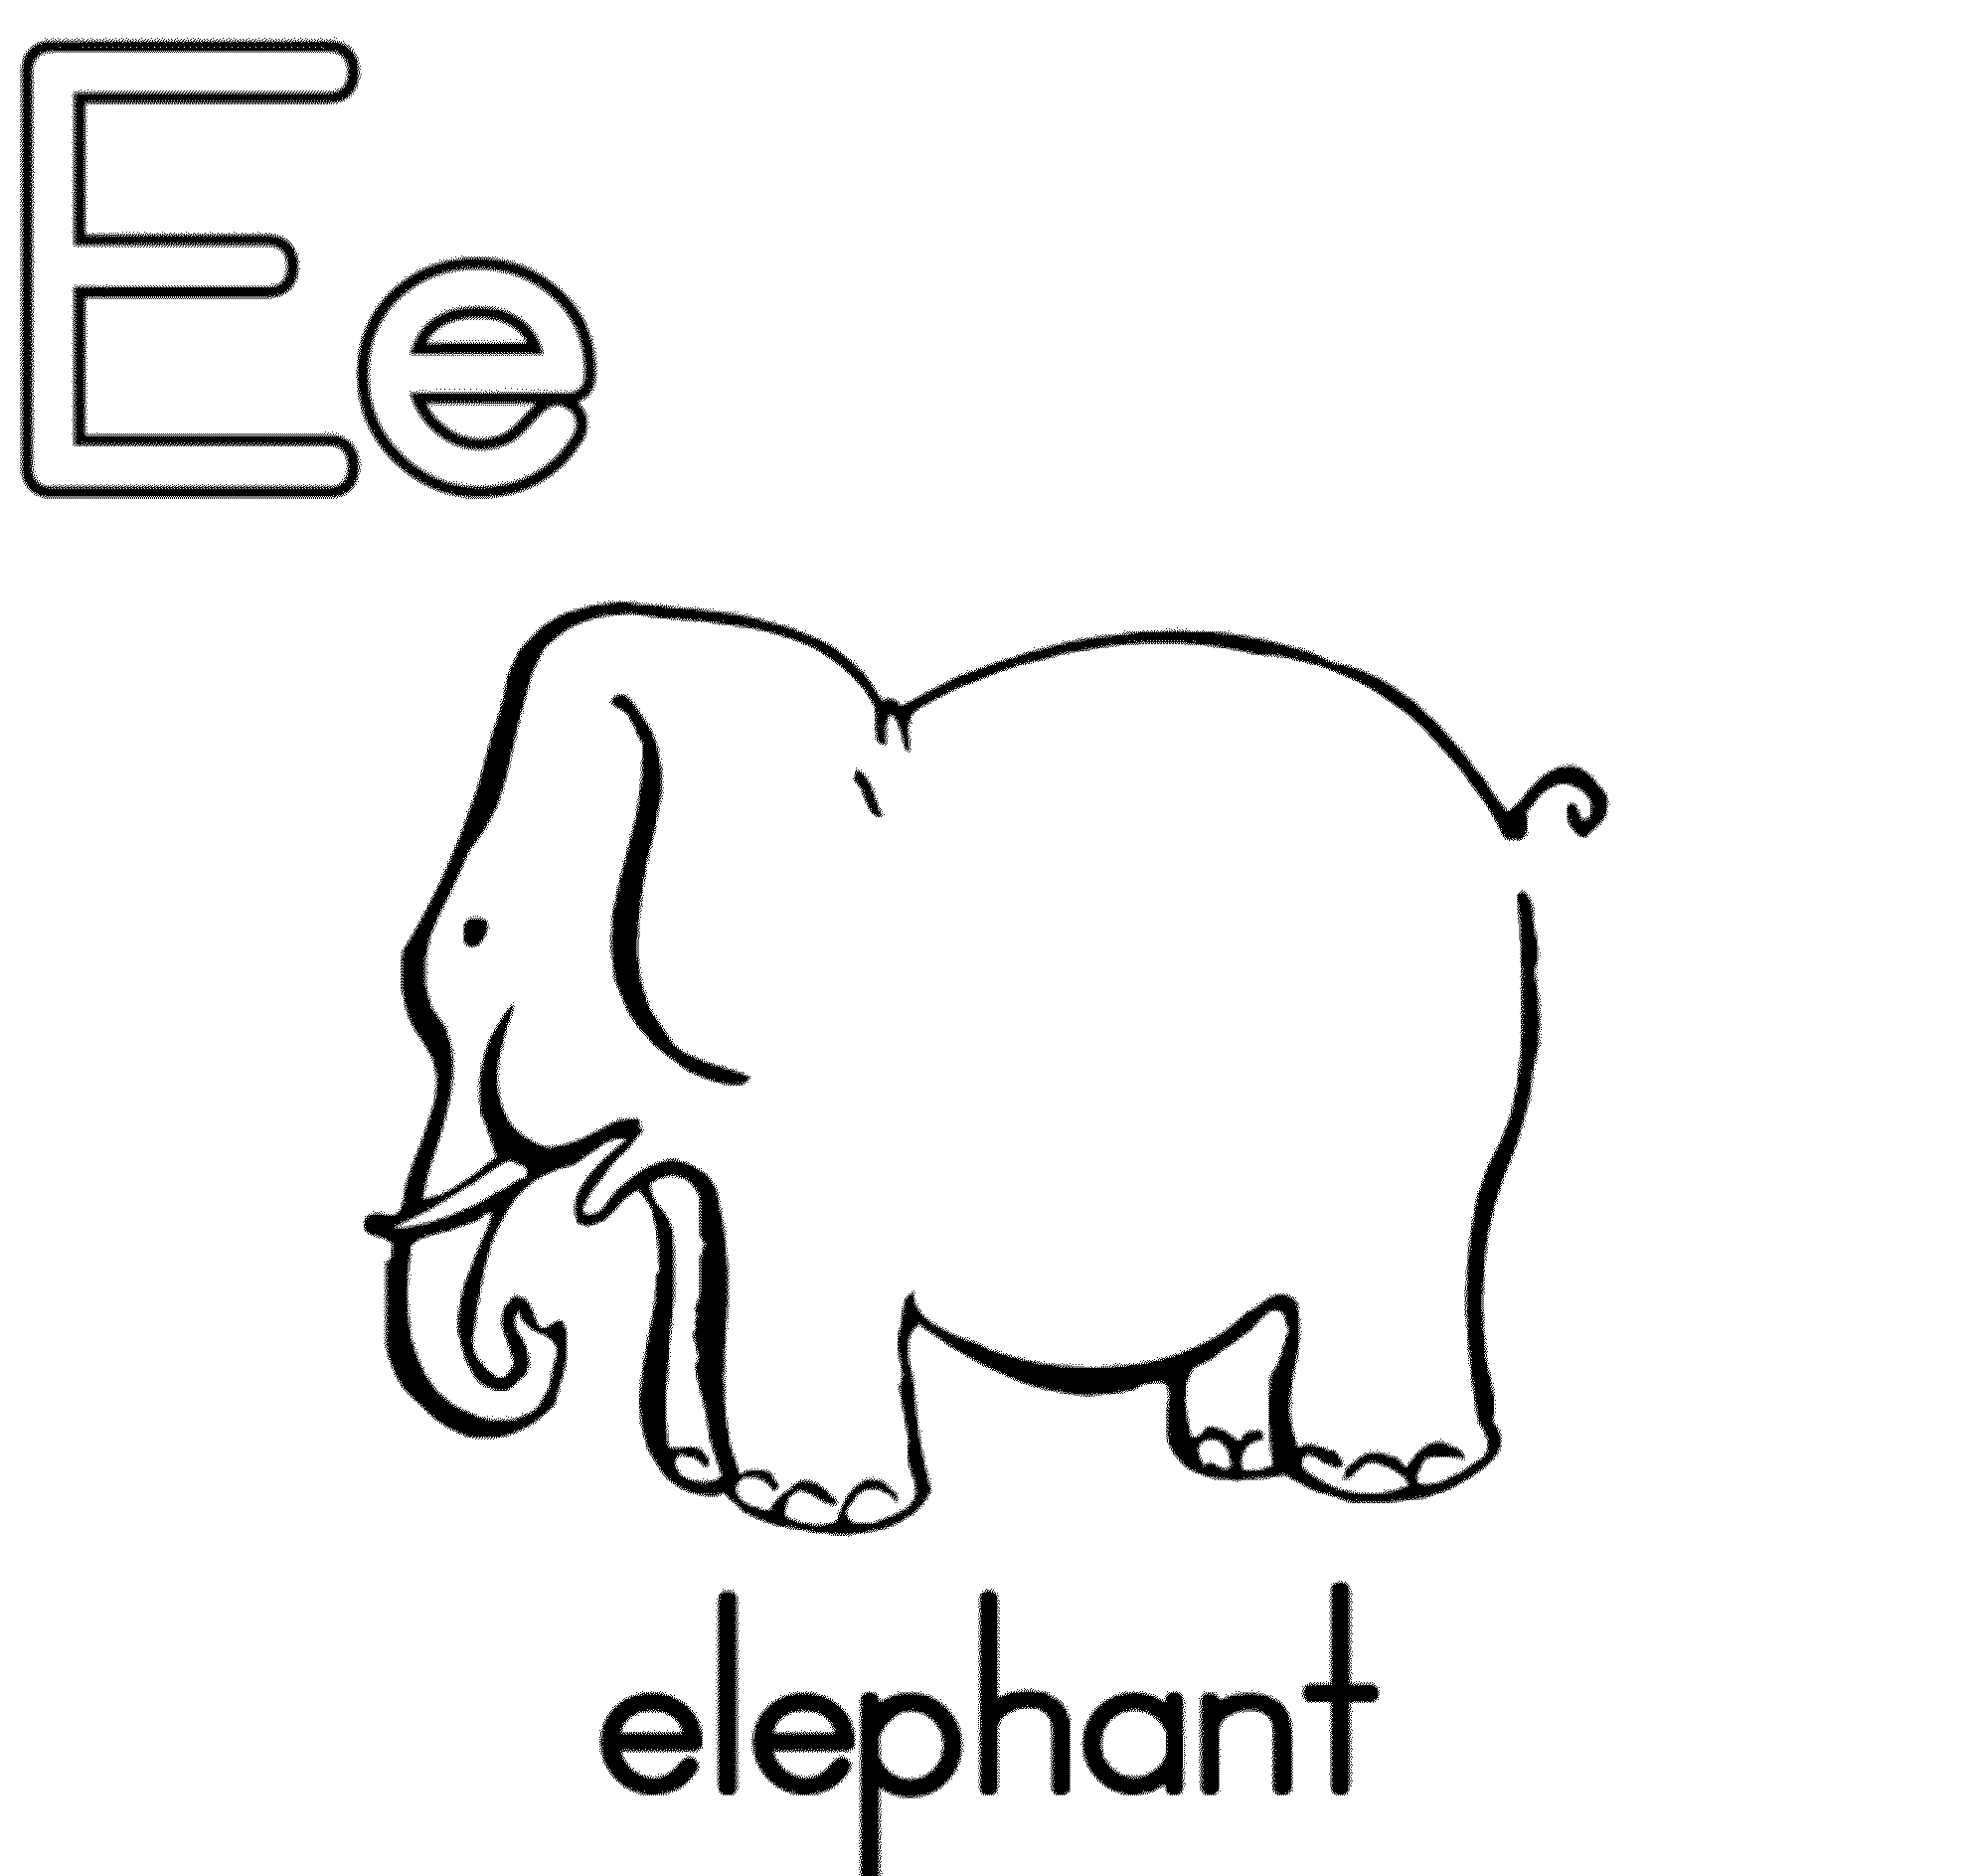 2000x1887 Letter E Coloring Pages